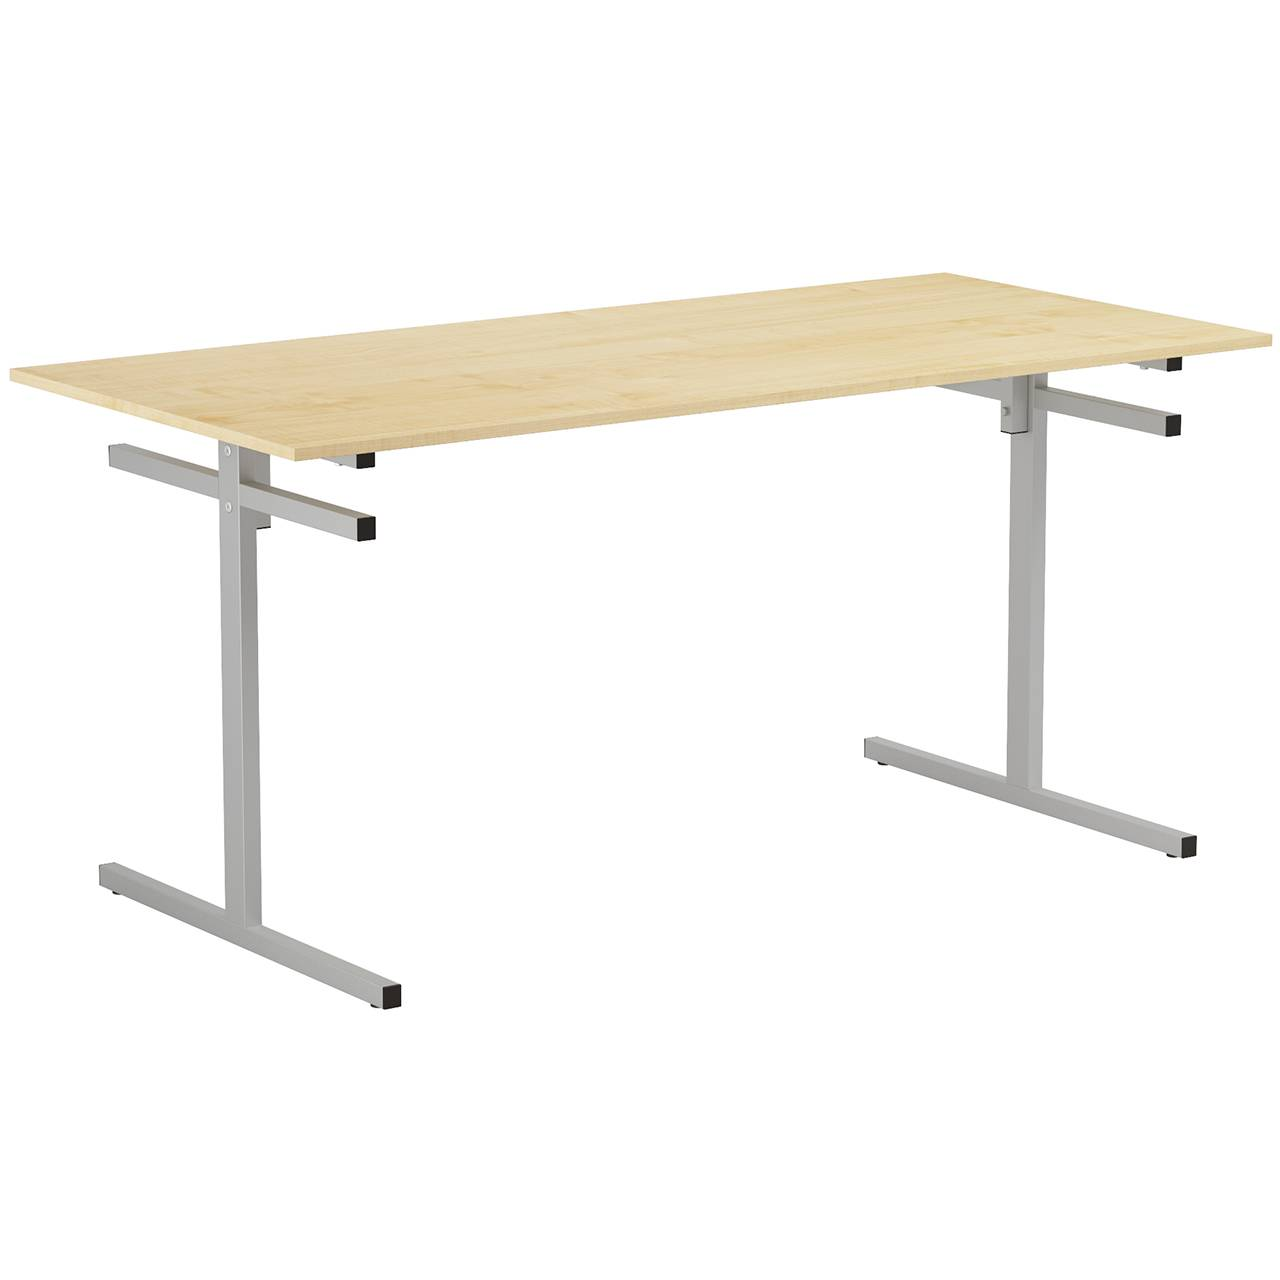 Стол для столовой 6-местный для скамеек (гр. 5,6) серый Клен 5 Пластик